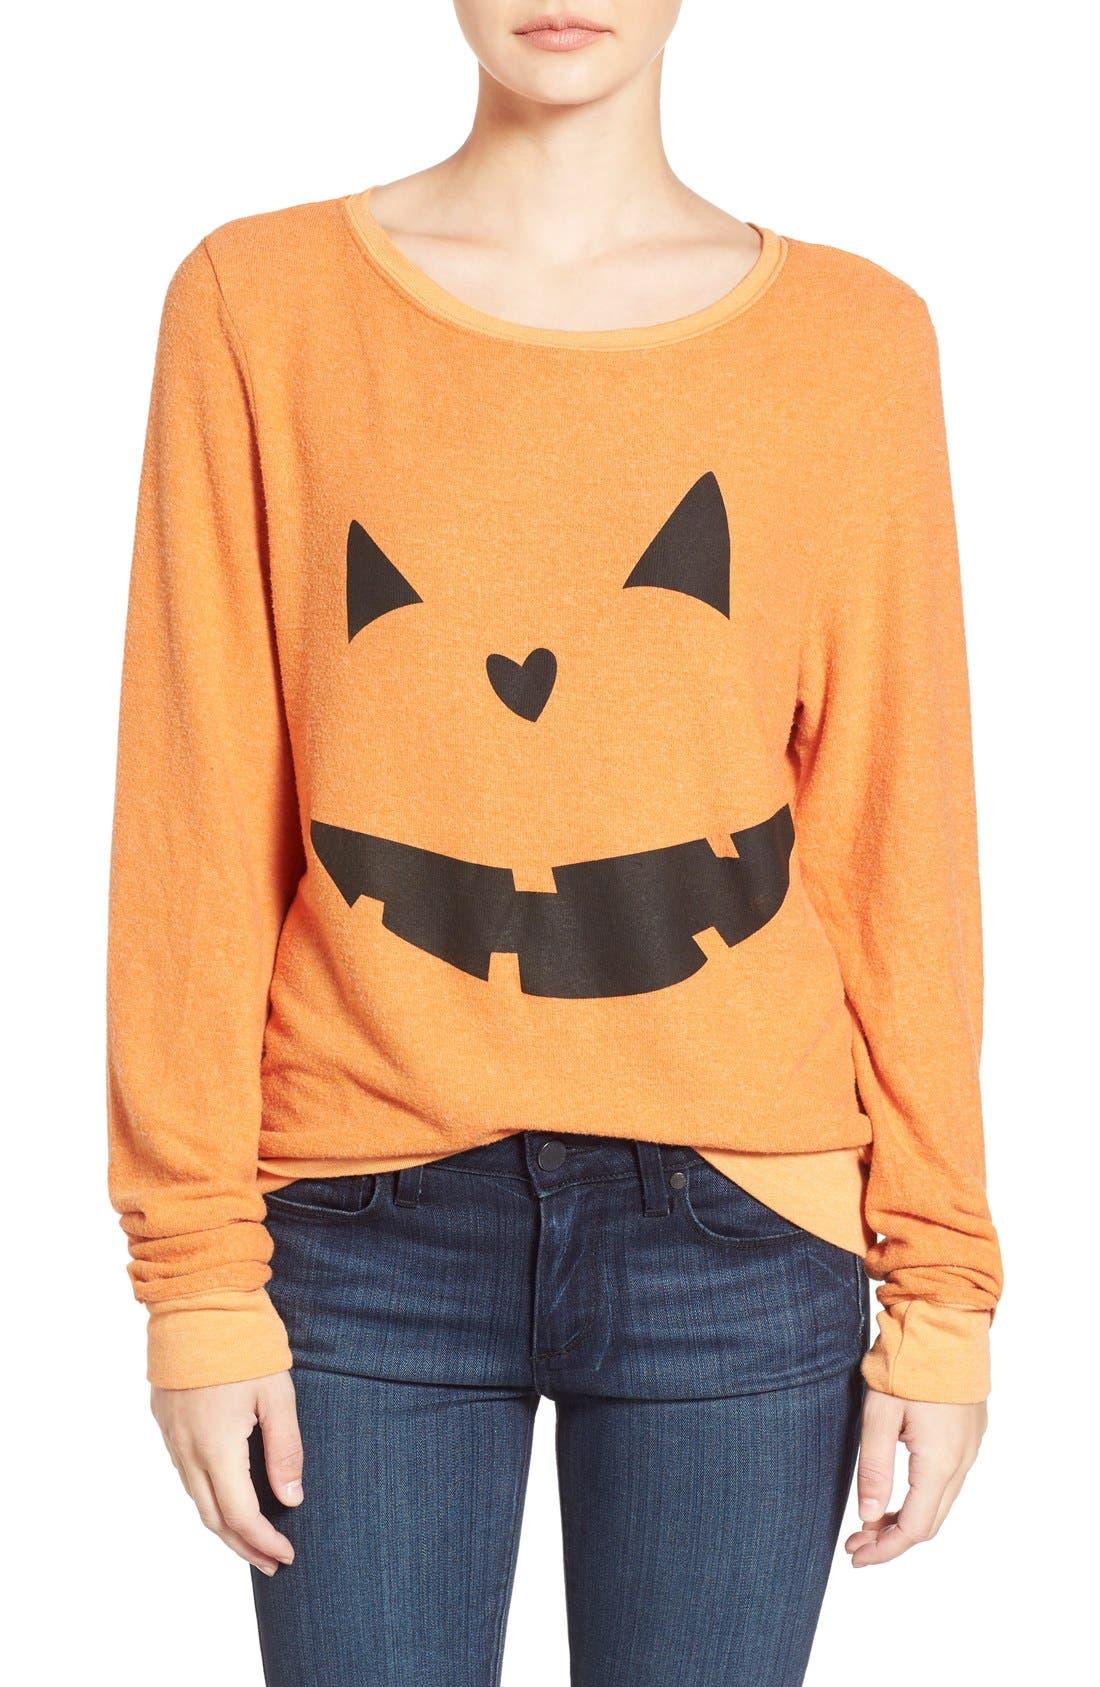 Main Image - Wildfox'Baggy Beach Jumper -Pumpkin Love' Pullover